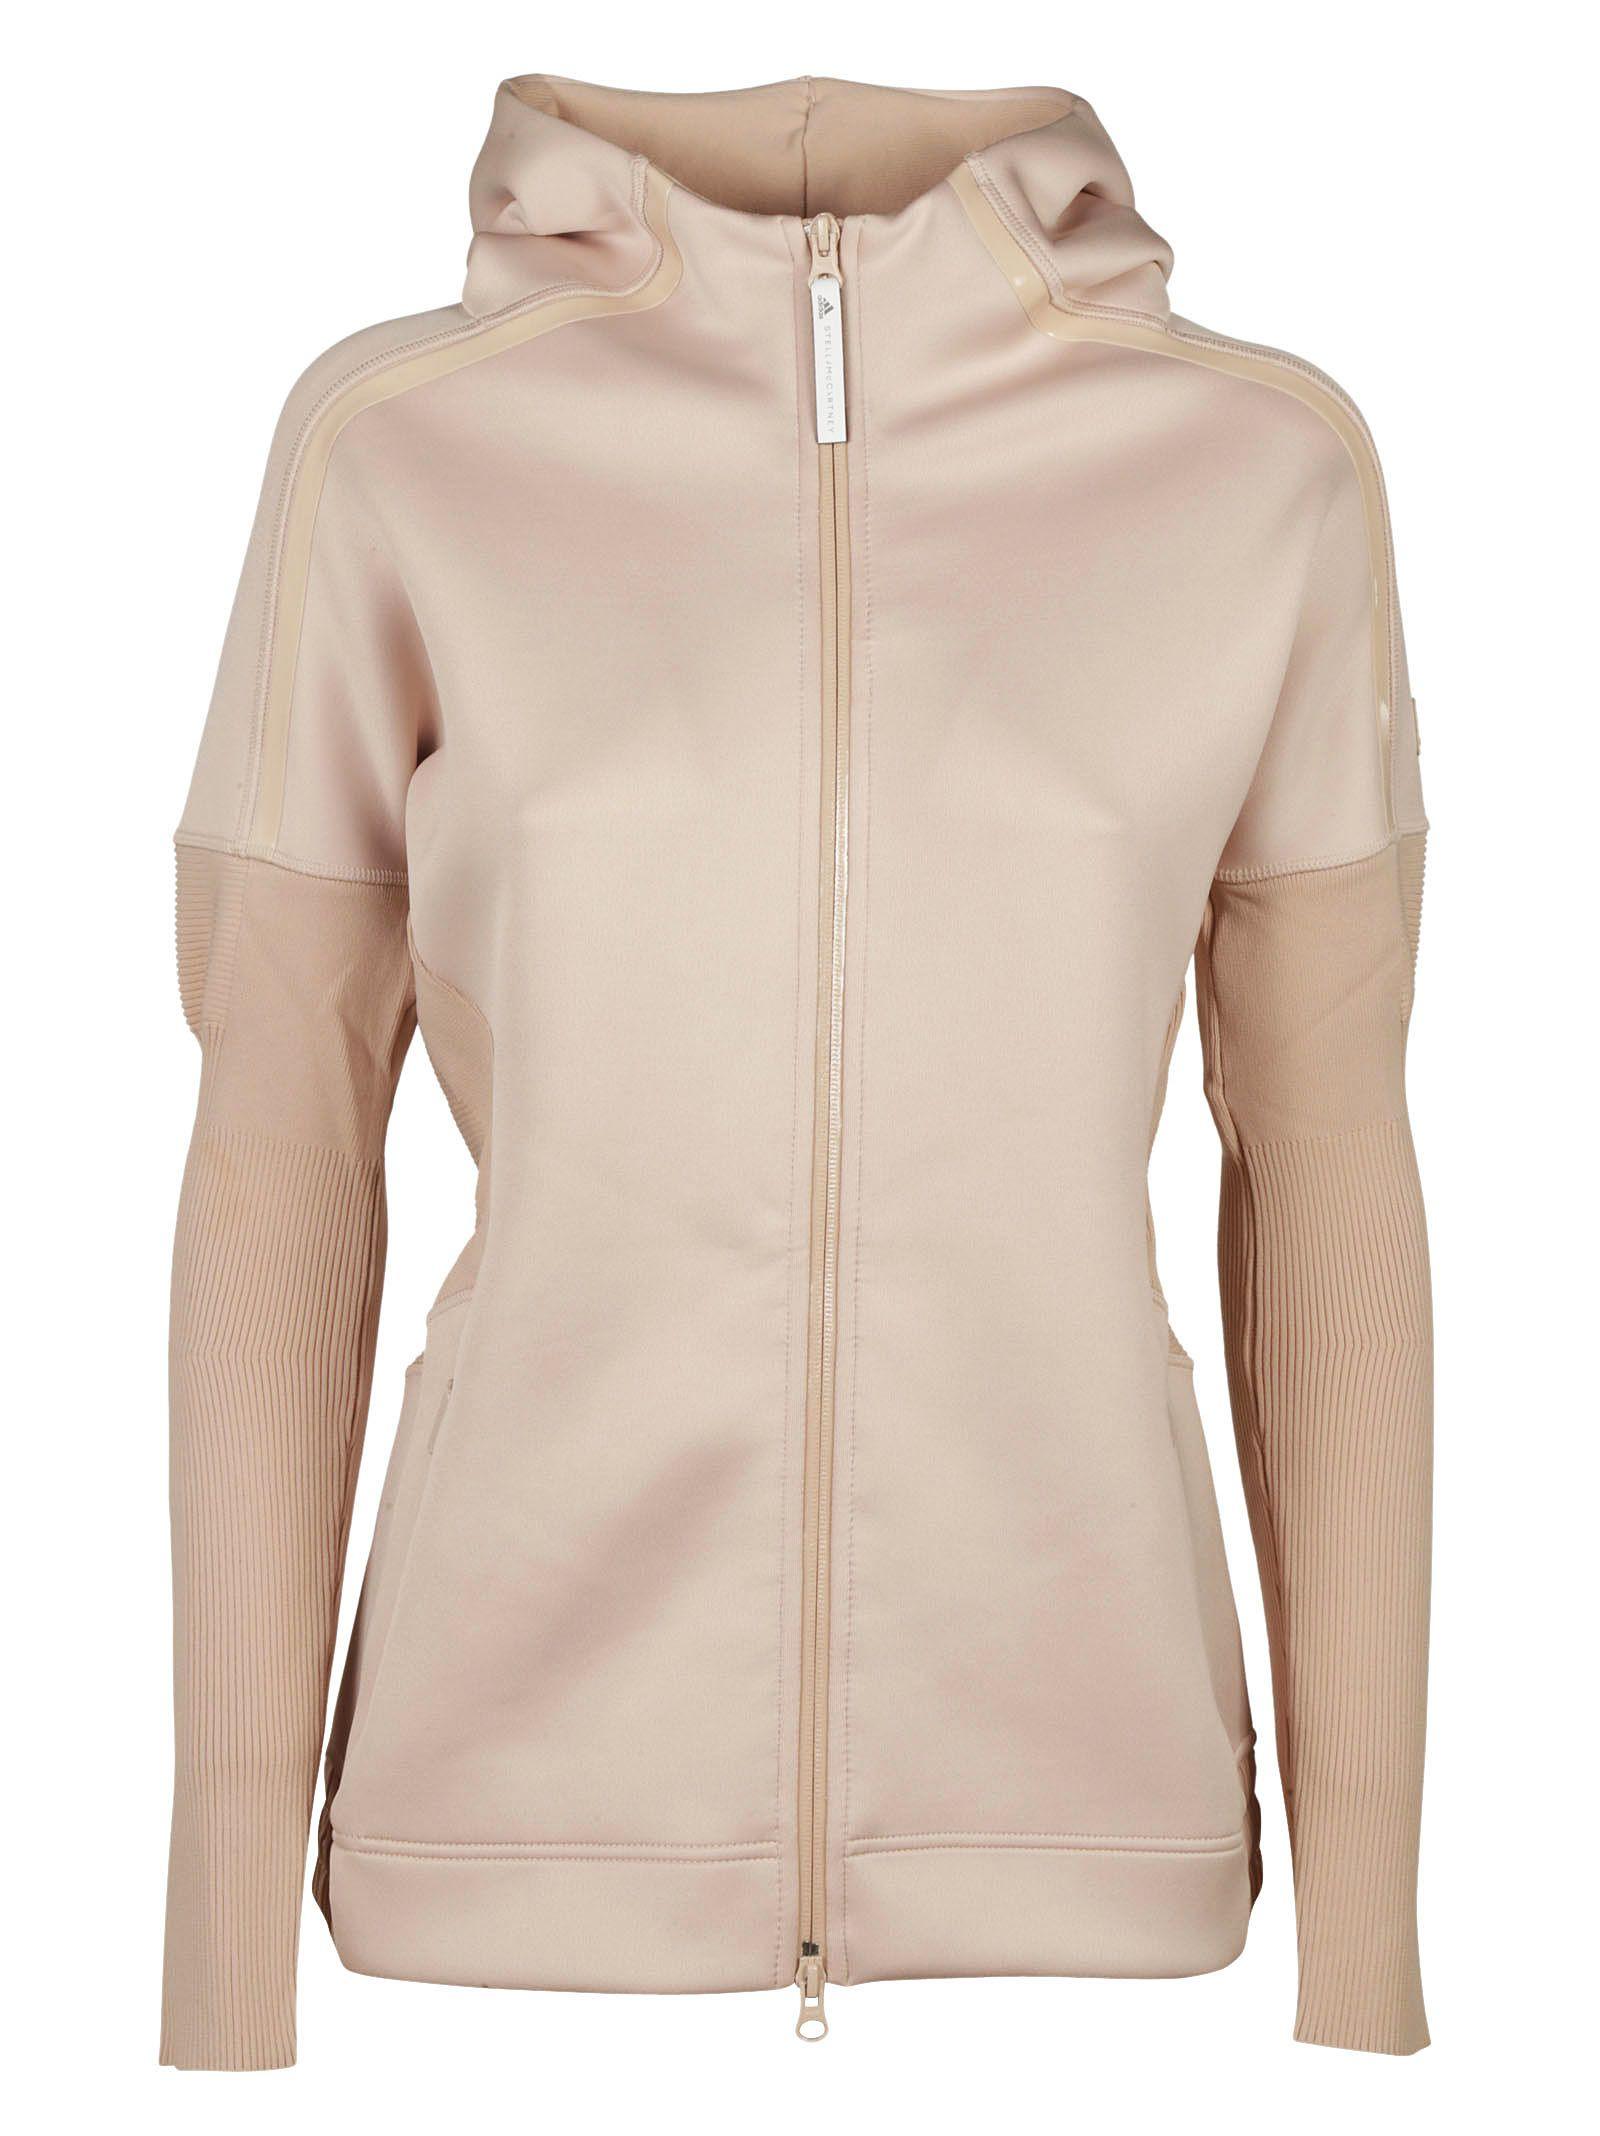 Adidas By Stella Mccartney Women S Sweatshirt Hood Hoodie In Pink ... 120cec88f4